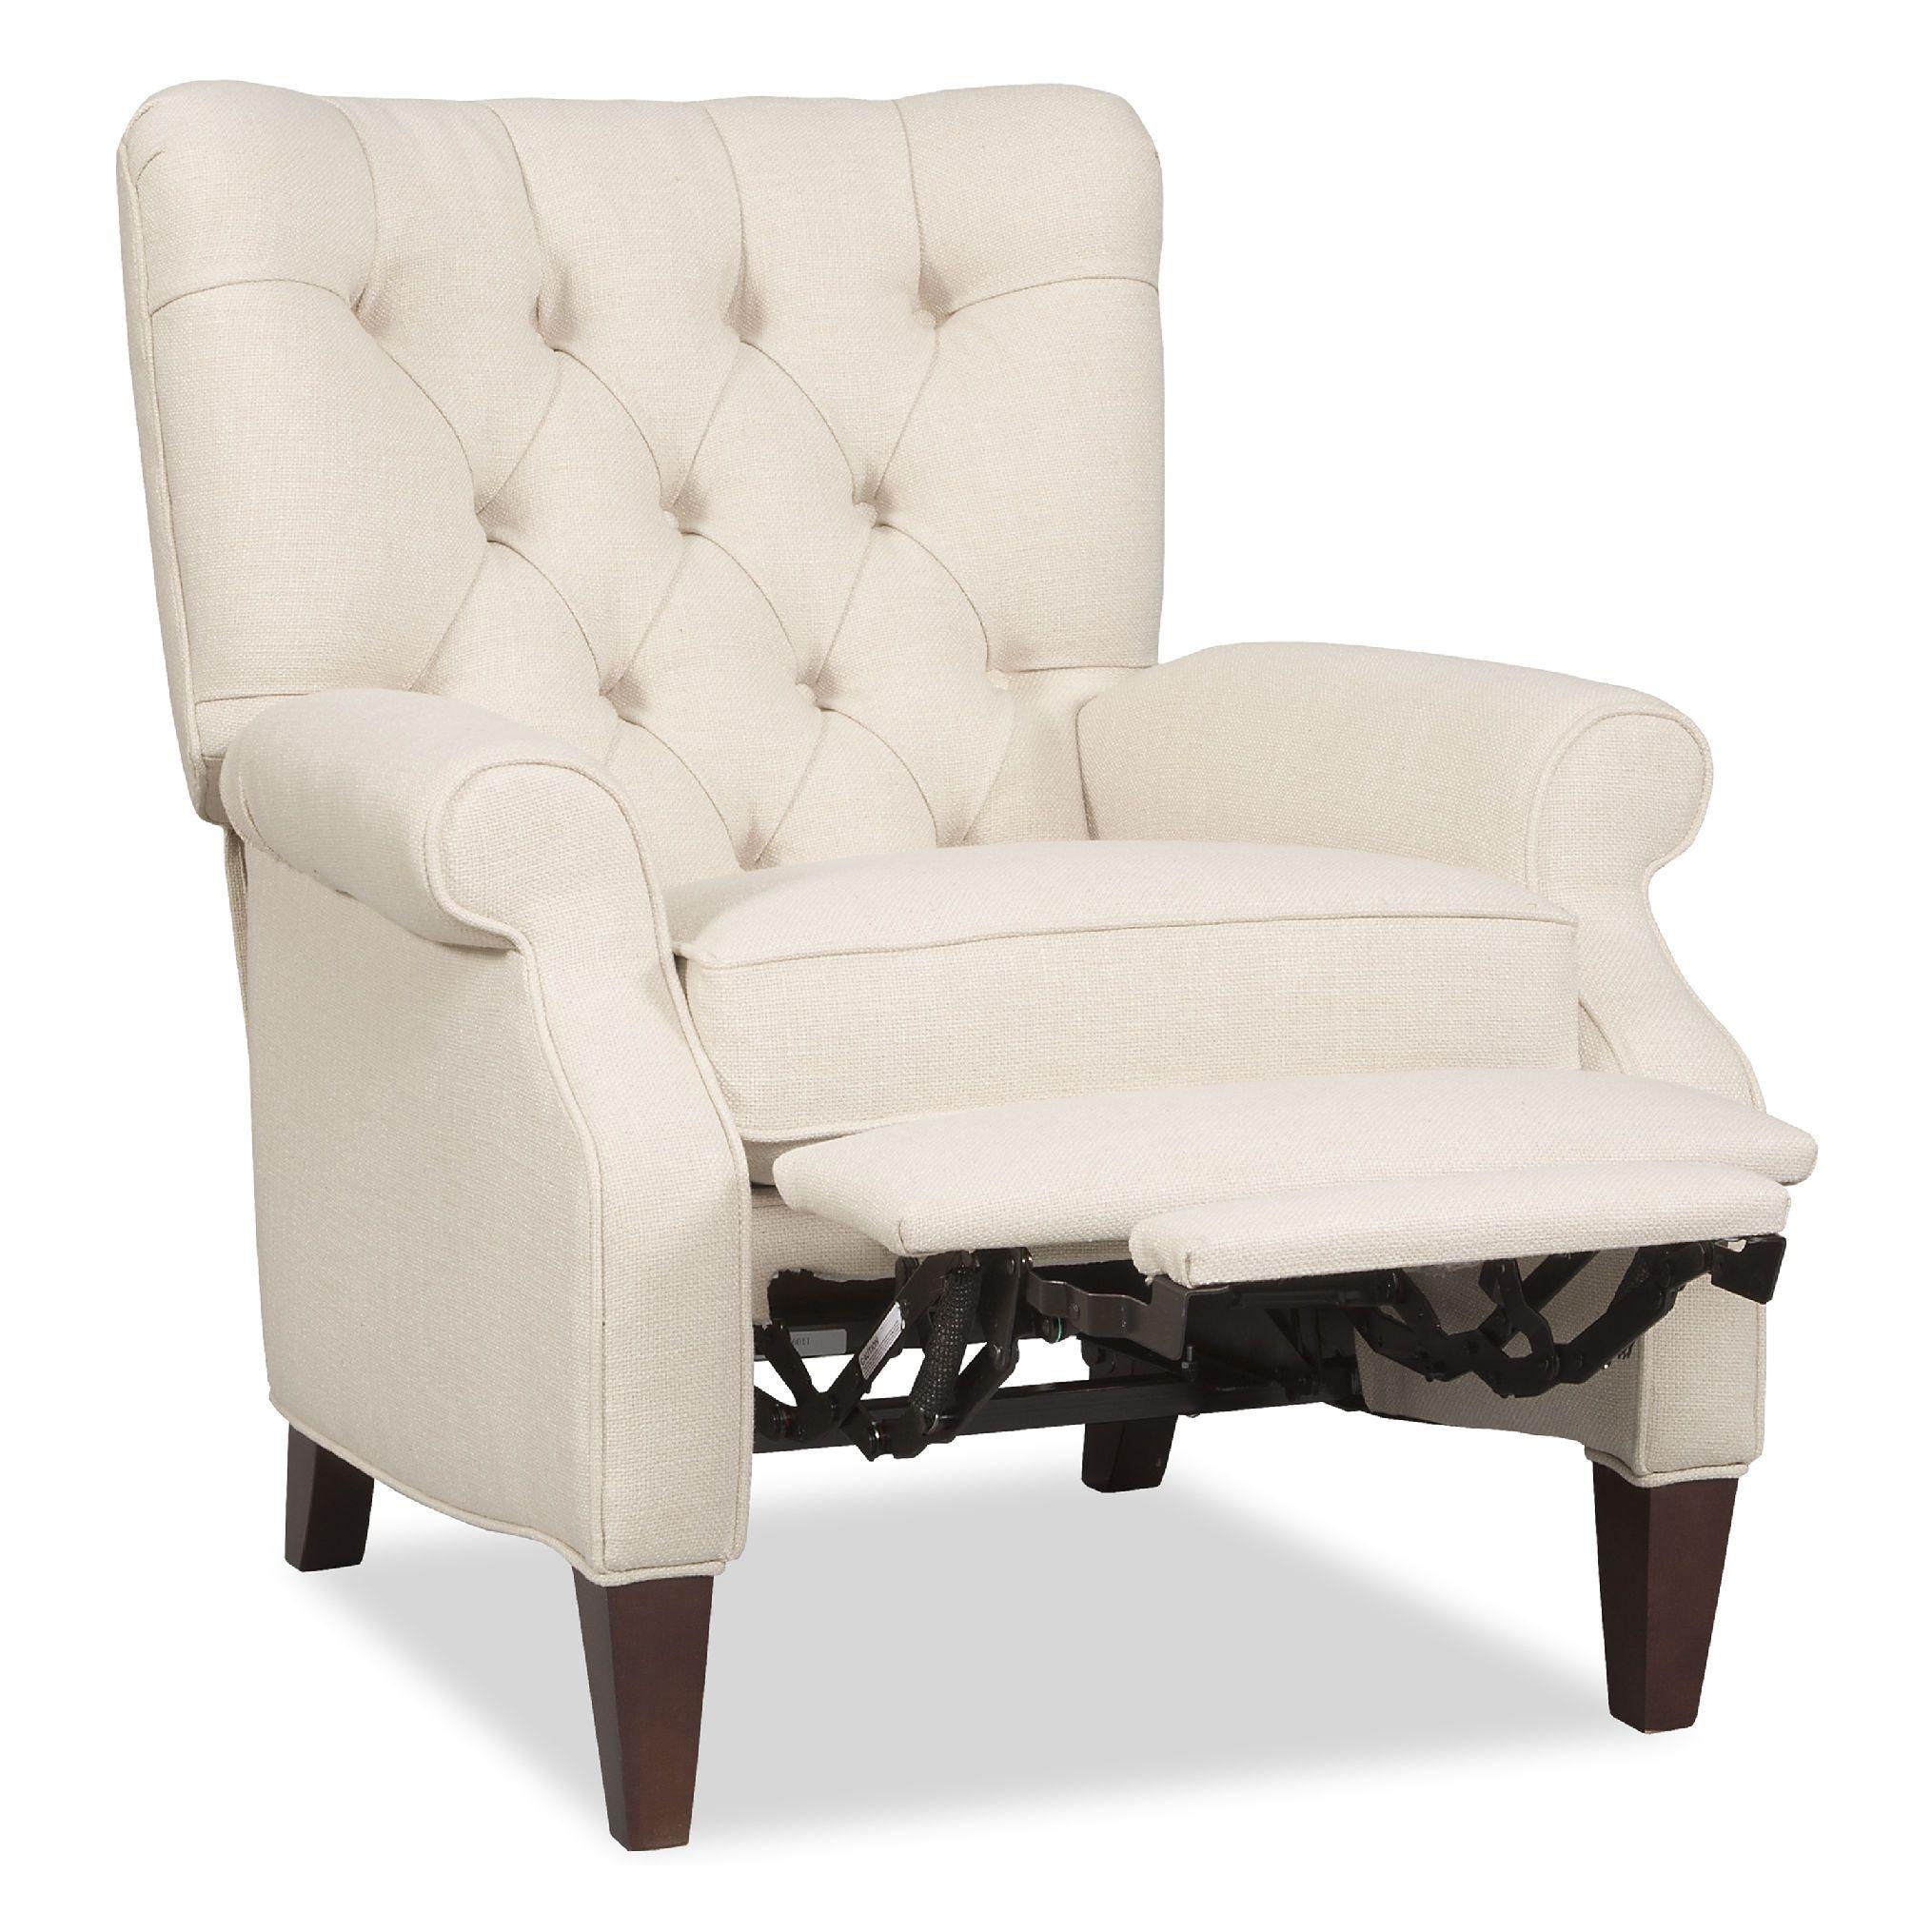 Sam Moore Living Room Annick Recliner 591027